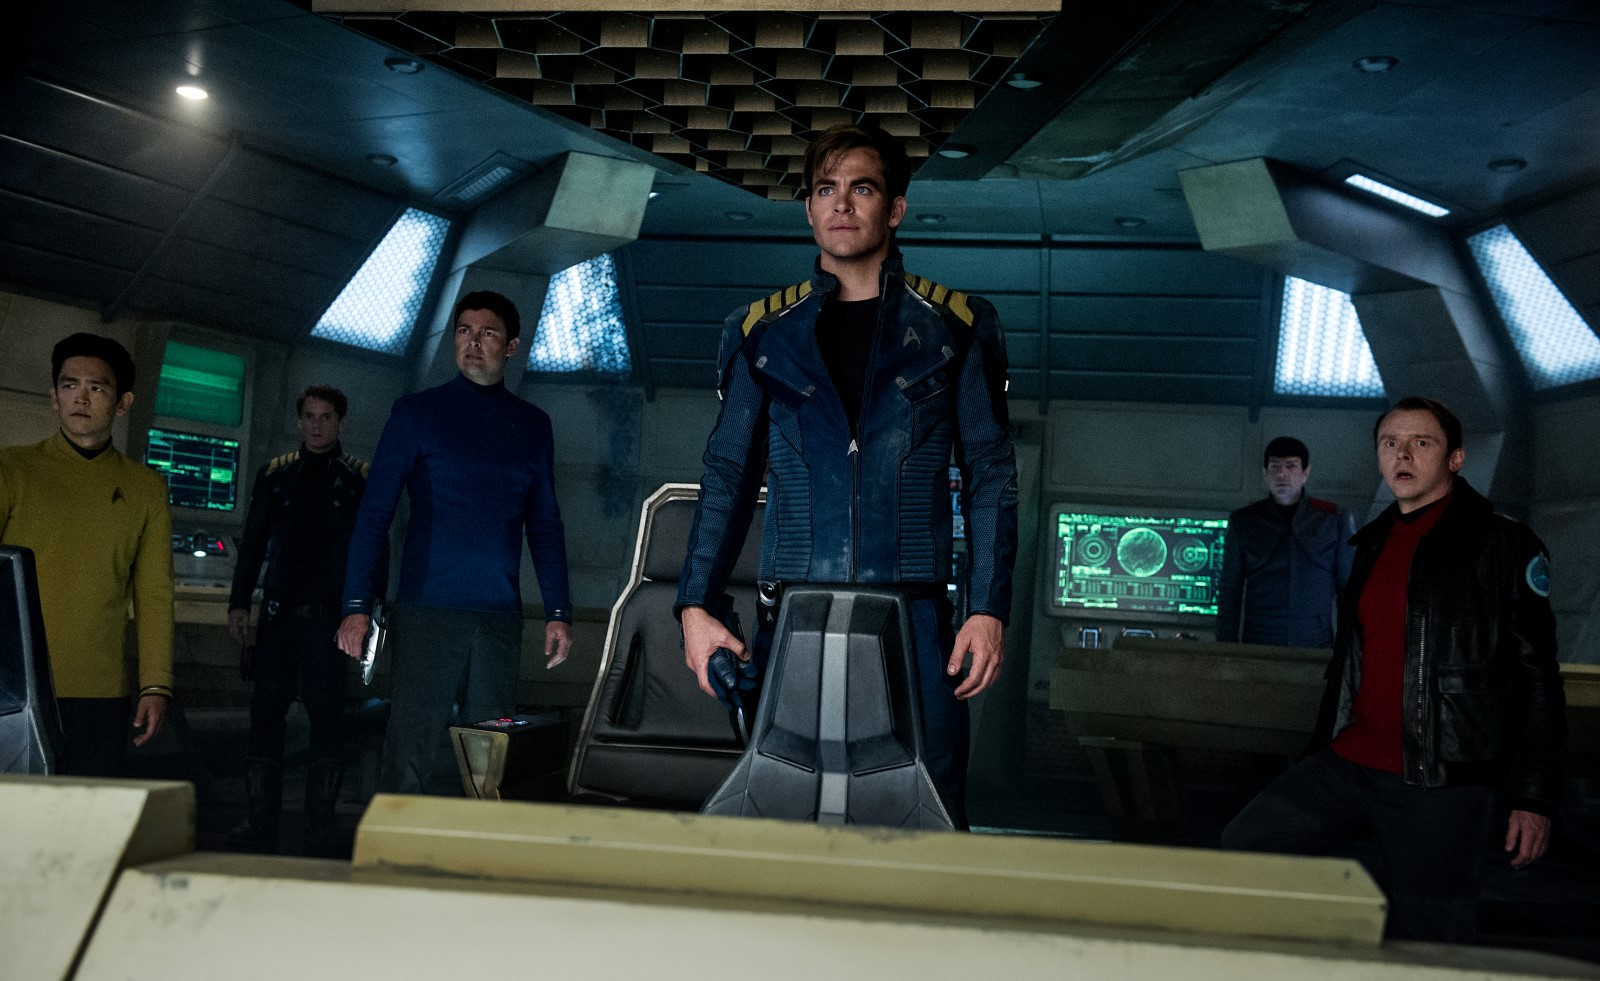 Star Trek Sans Limites (Star Trek Beyond) 2016 (Anton Yelchin, John Cho, Karl Urban, Simon Pegg, Zachary Quinto)